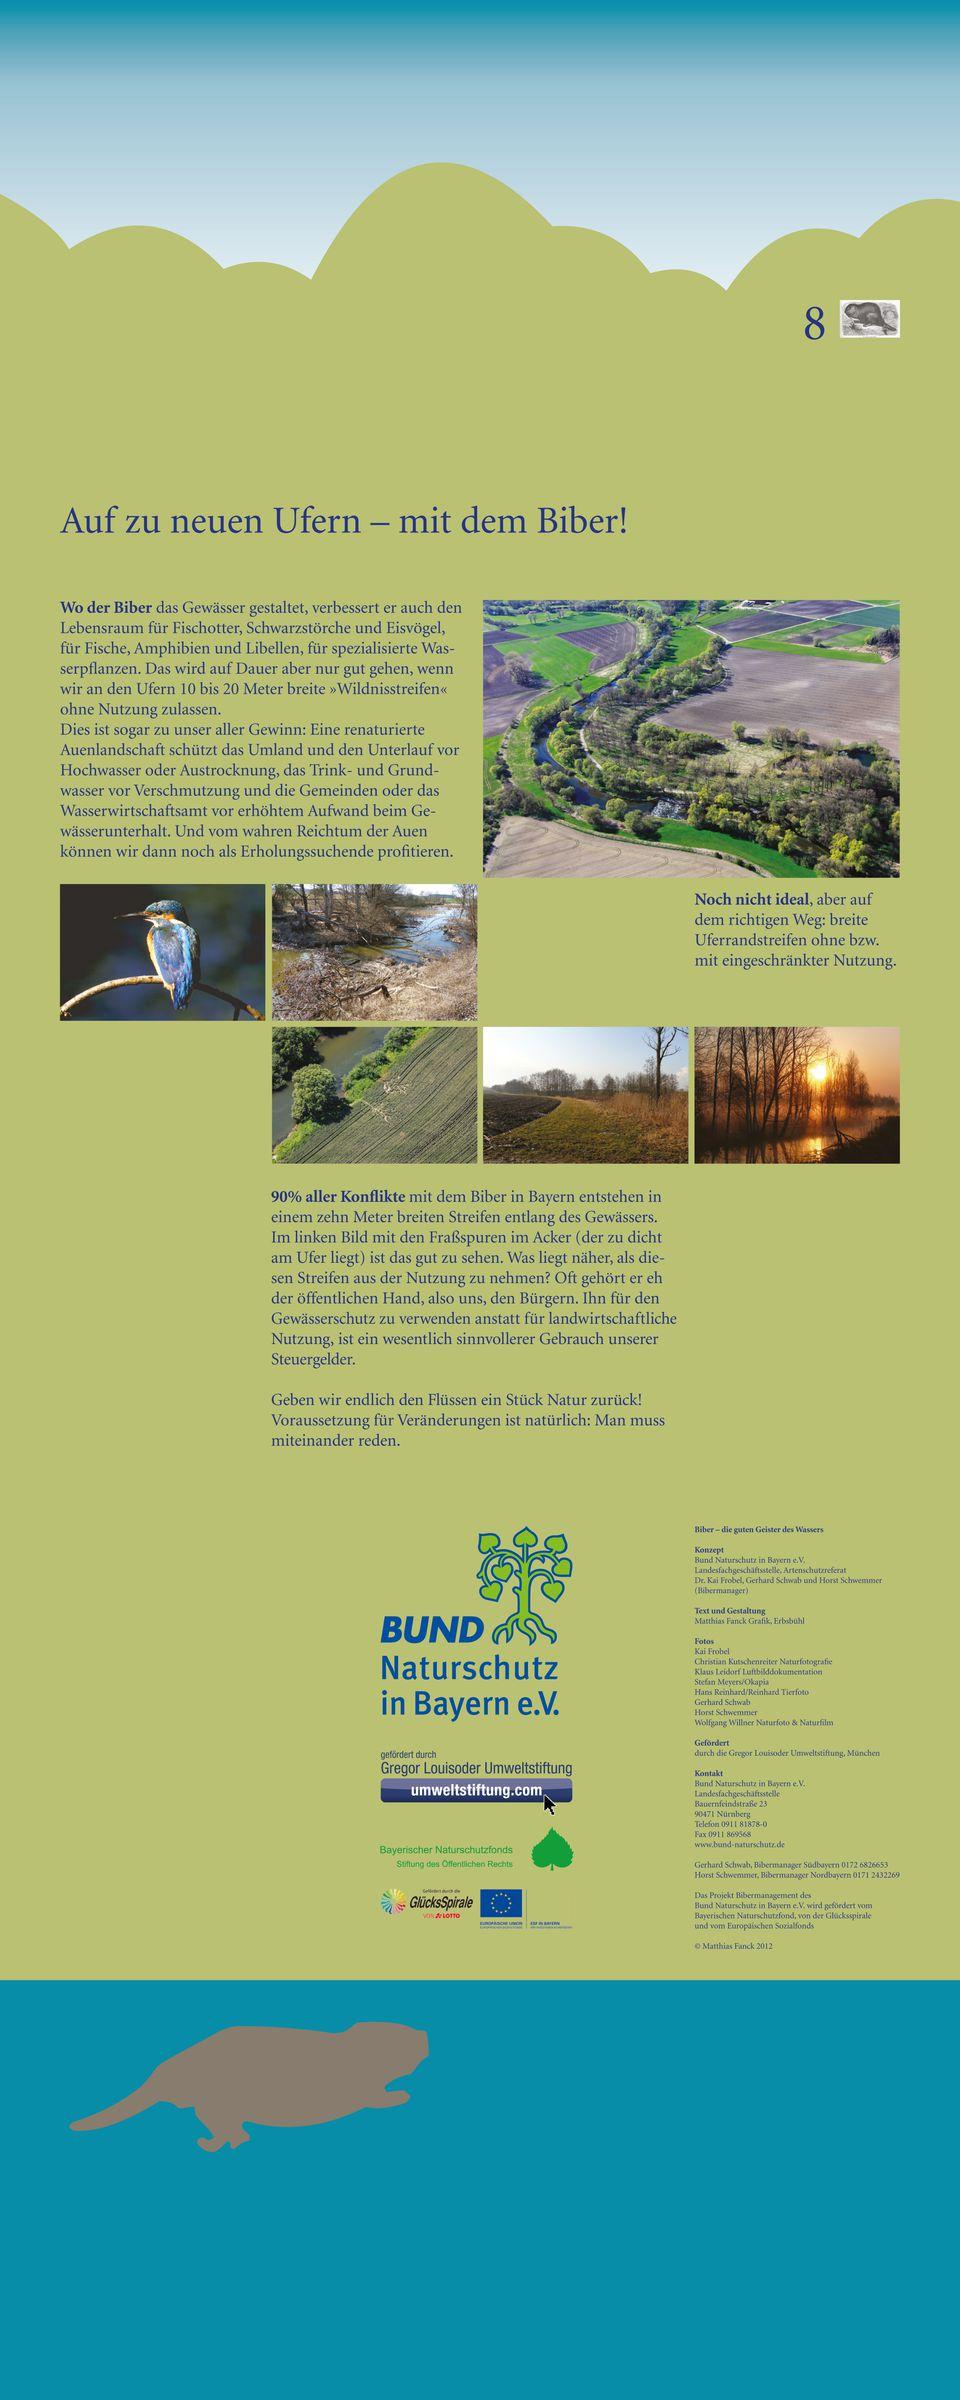 Biber Bund Naturschutz In Bayern E V